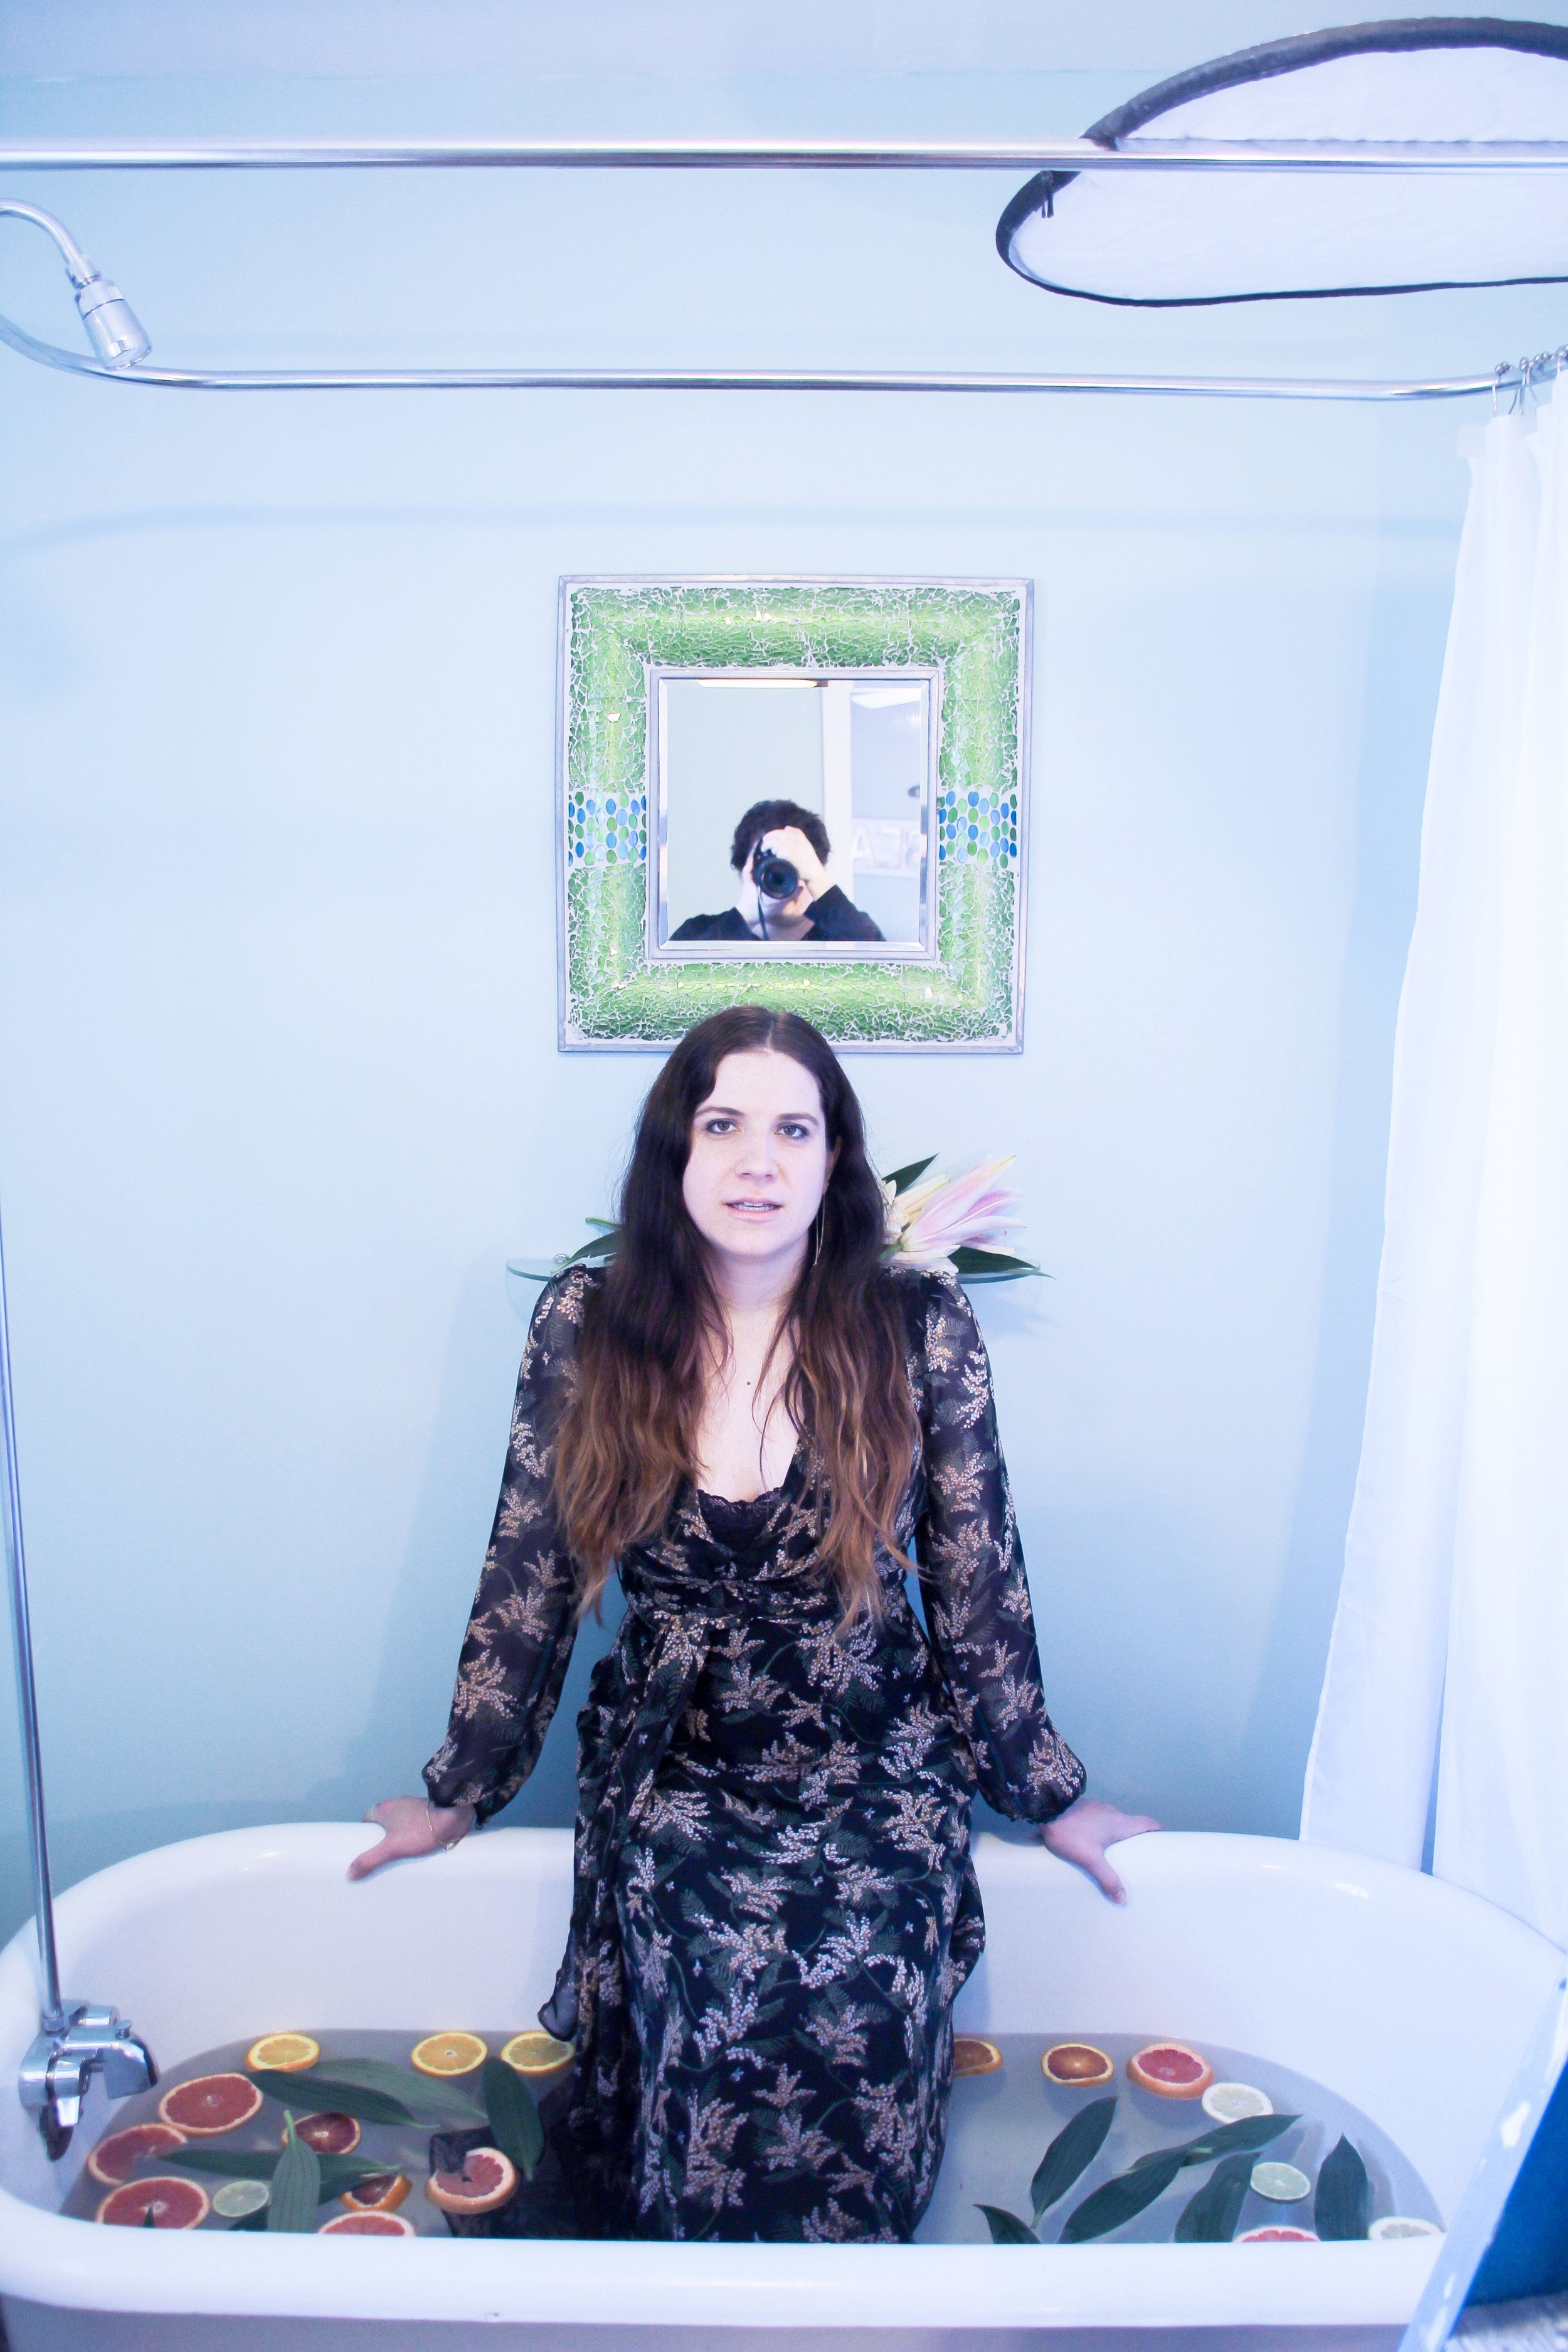 Joannah in the Tub (1).jpg